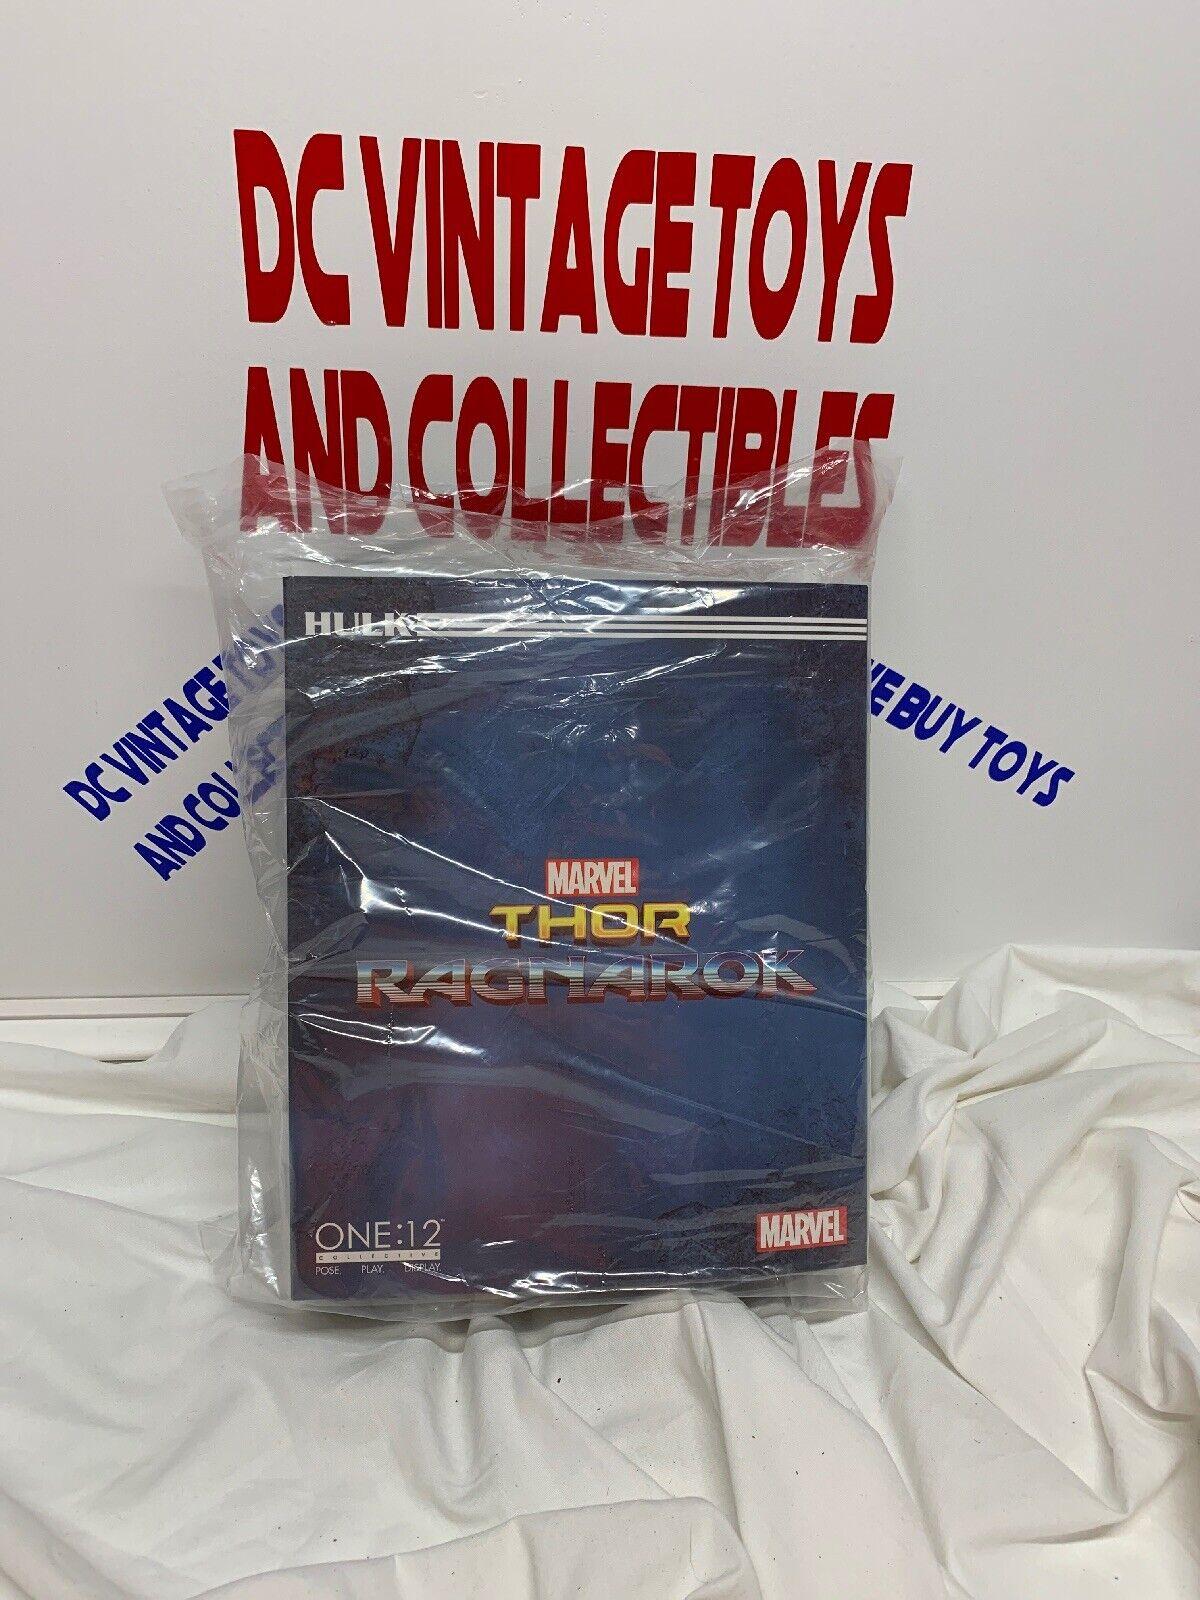 NIB USA  Mezco Toys One 12  Marvel Thor Ragnarok Gladiator Hulk Action Figure  économiser jusqu'à 70% de réduction